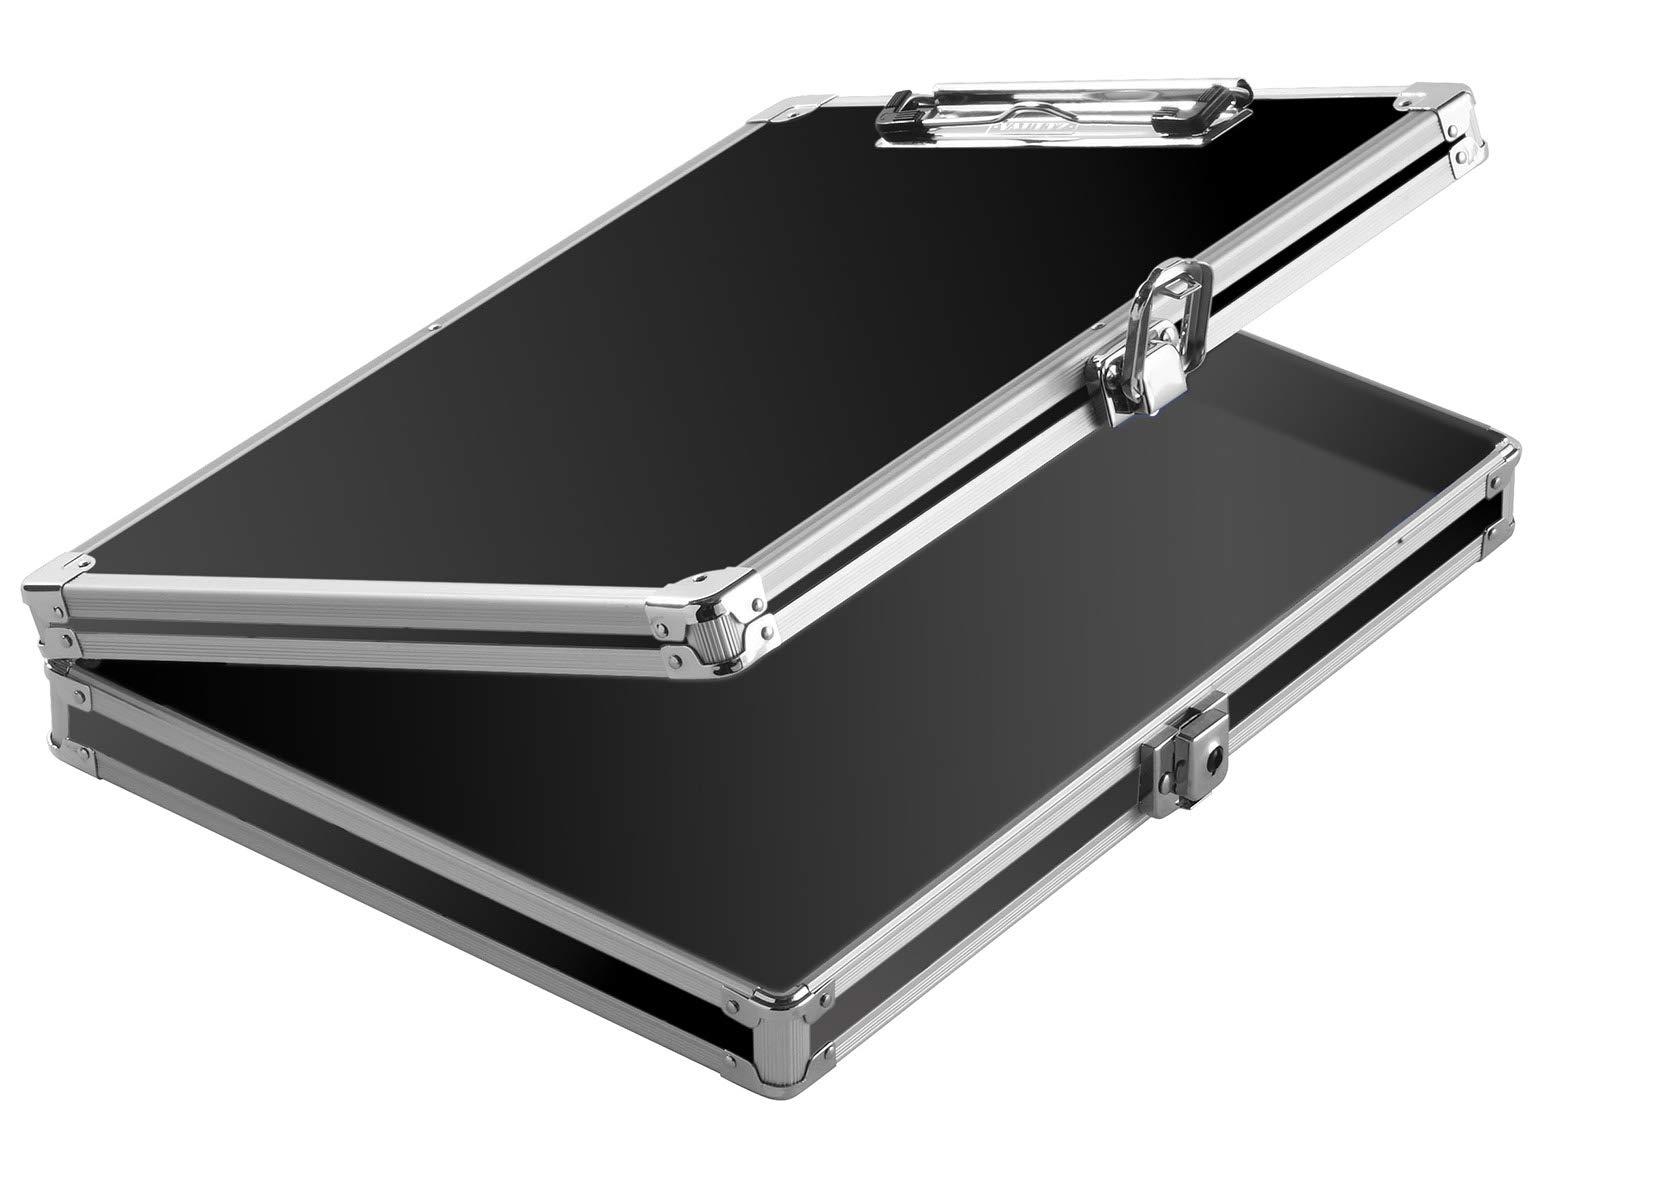 Vaultz Locking Storage Clipboard for Letter Size Sheets, Key Lock, Black, Case of 3 Clipboards (VZ00151-C)